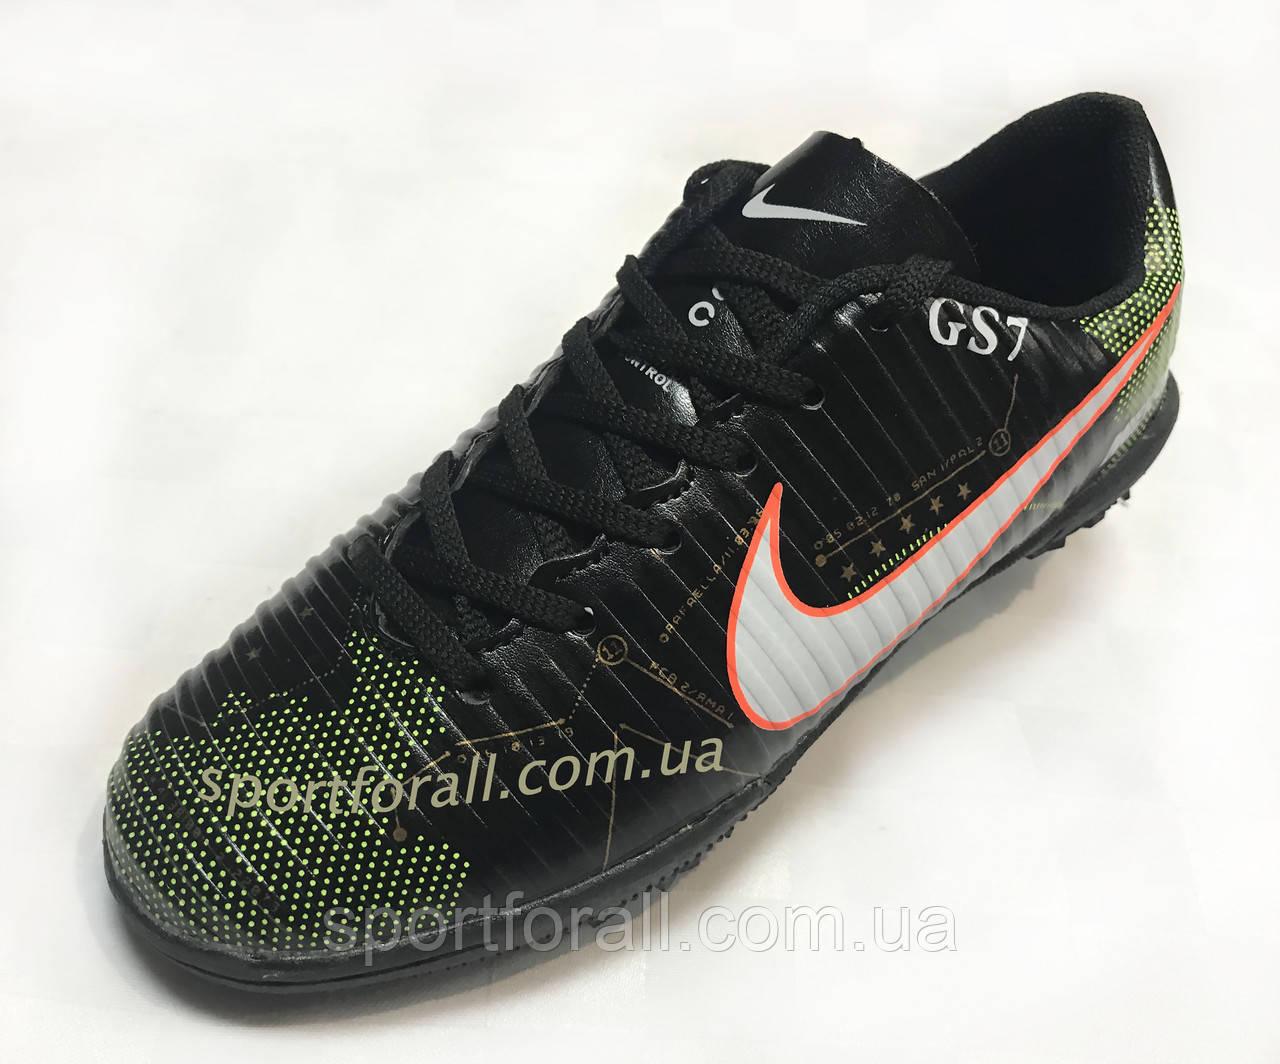 34ce22103fcd35 Сороконожки Nike MERCURIAL X GS7 Р 31-36 (чёрные) — в Категории ...